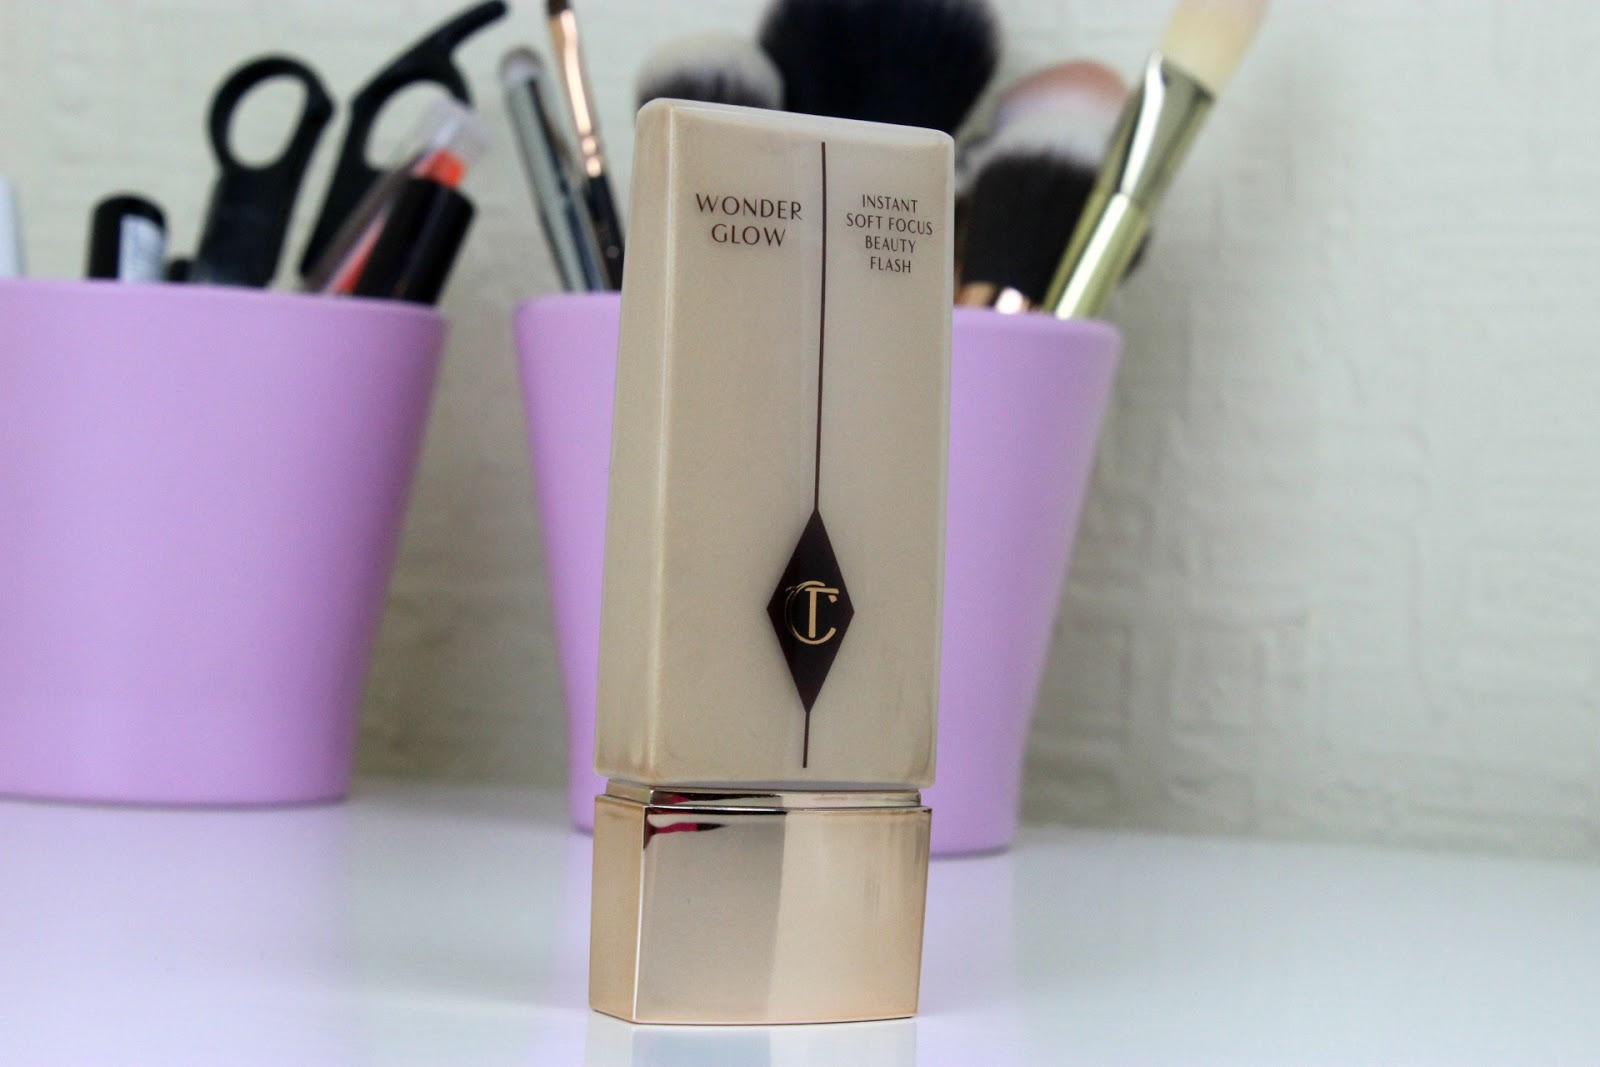 Charlotte Tilbury Wonder Glow - Instant Soft Focus Beauty ...